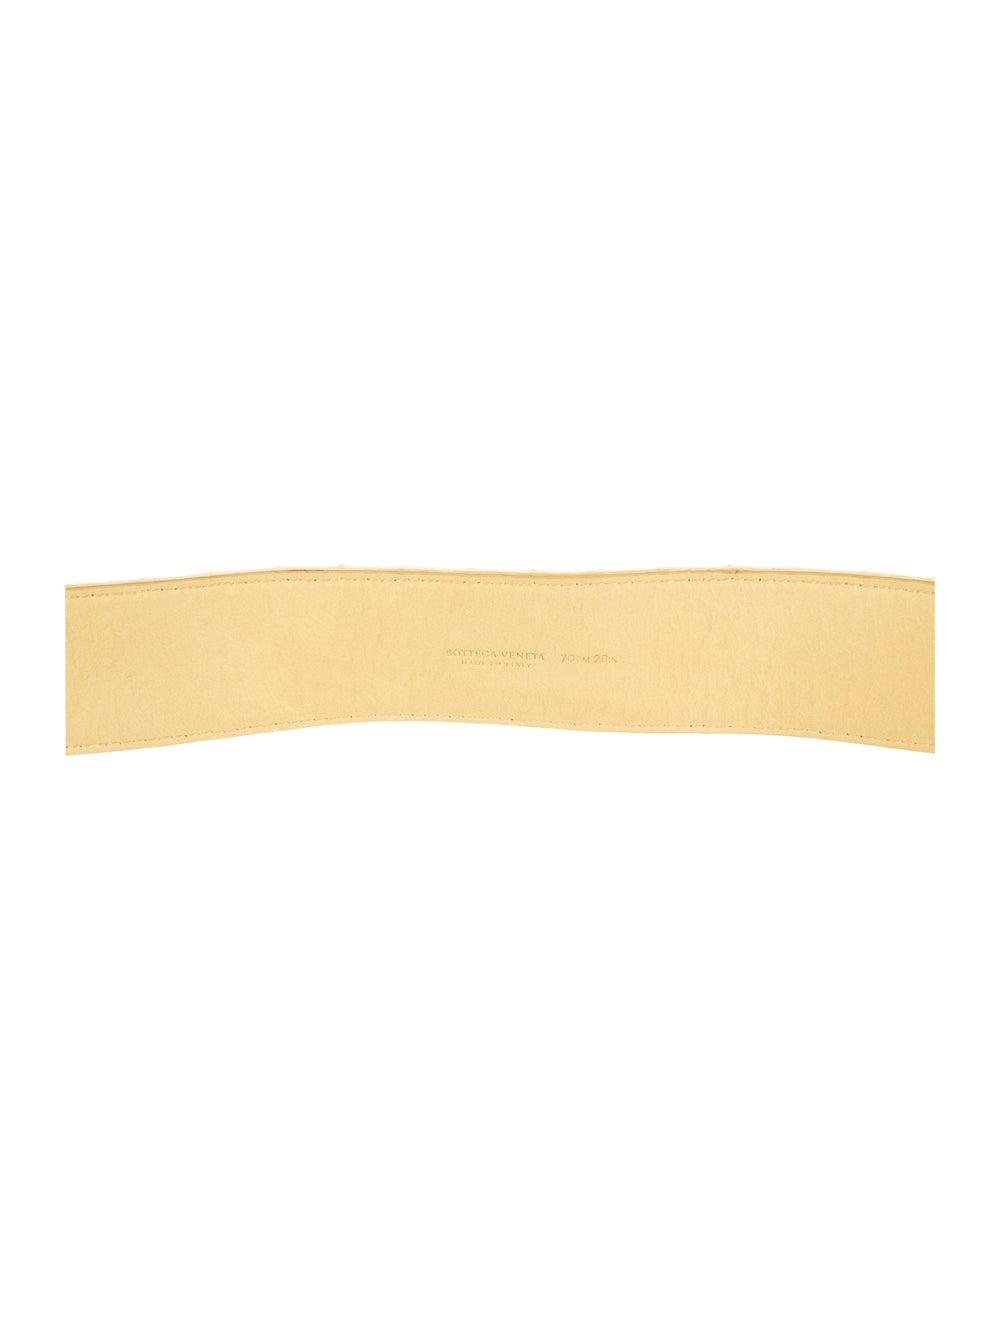 Bottega Veneta Intrecciato Weave Leather Waist Be… - image 2